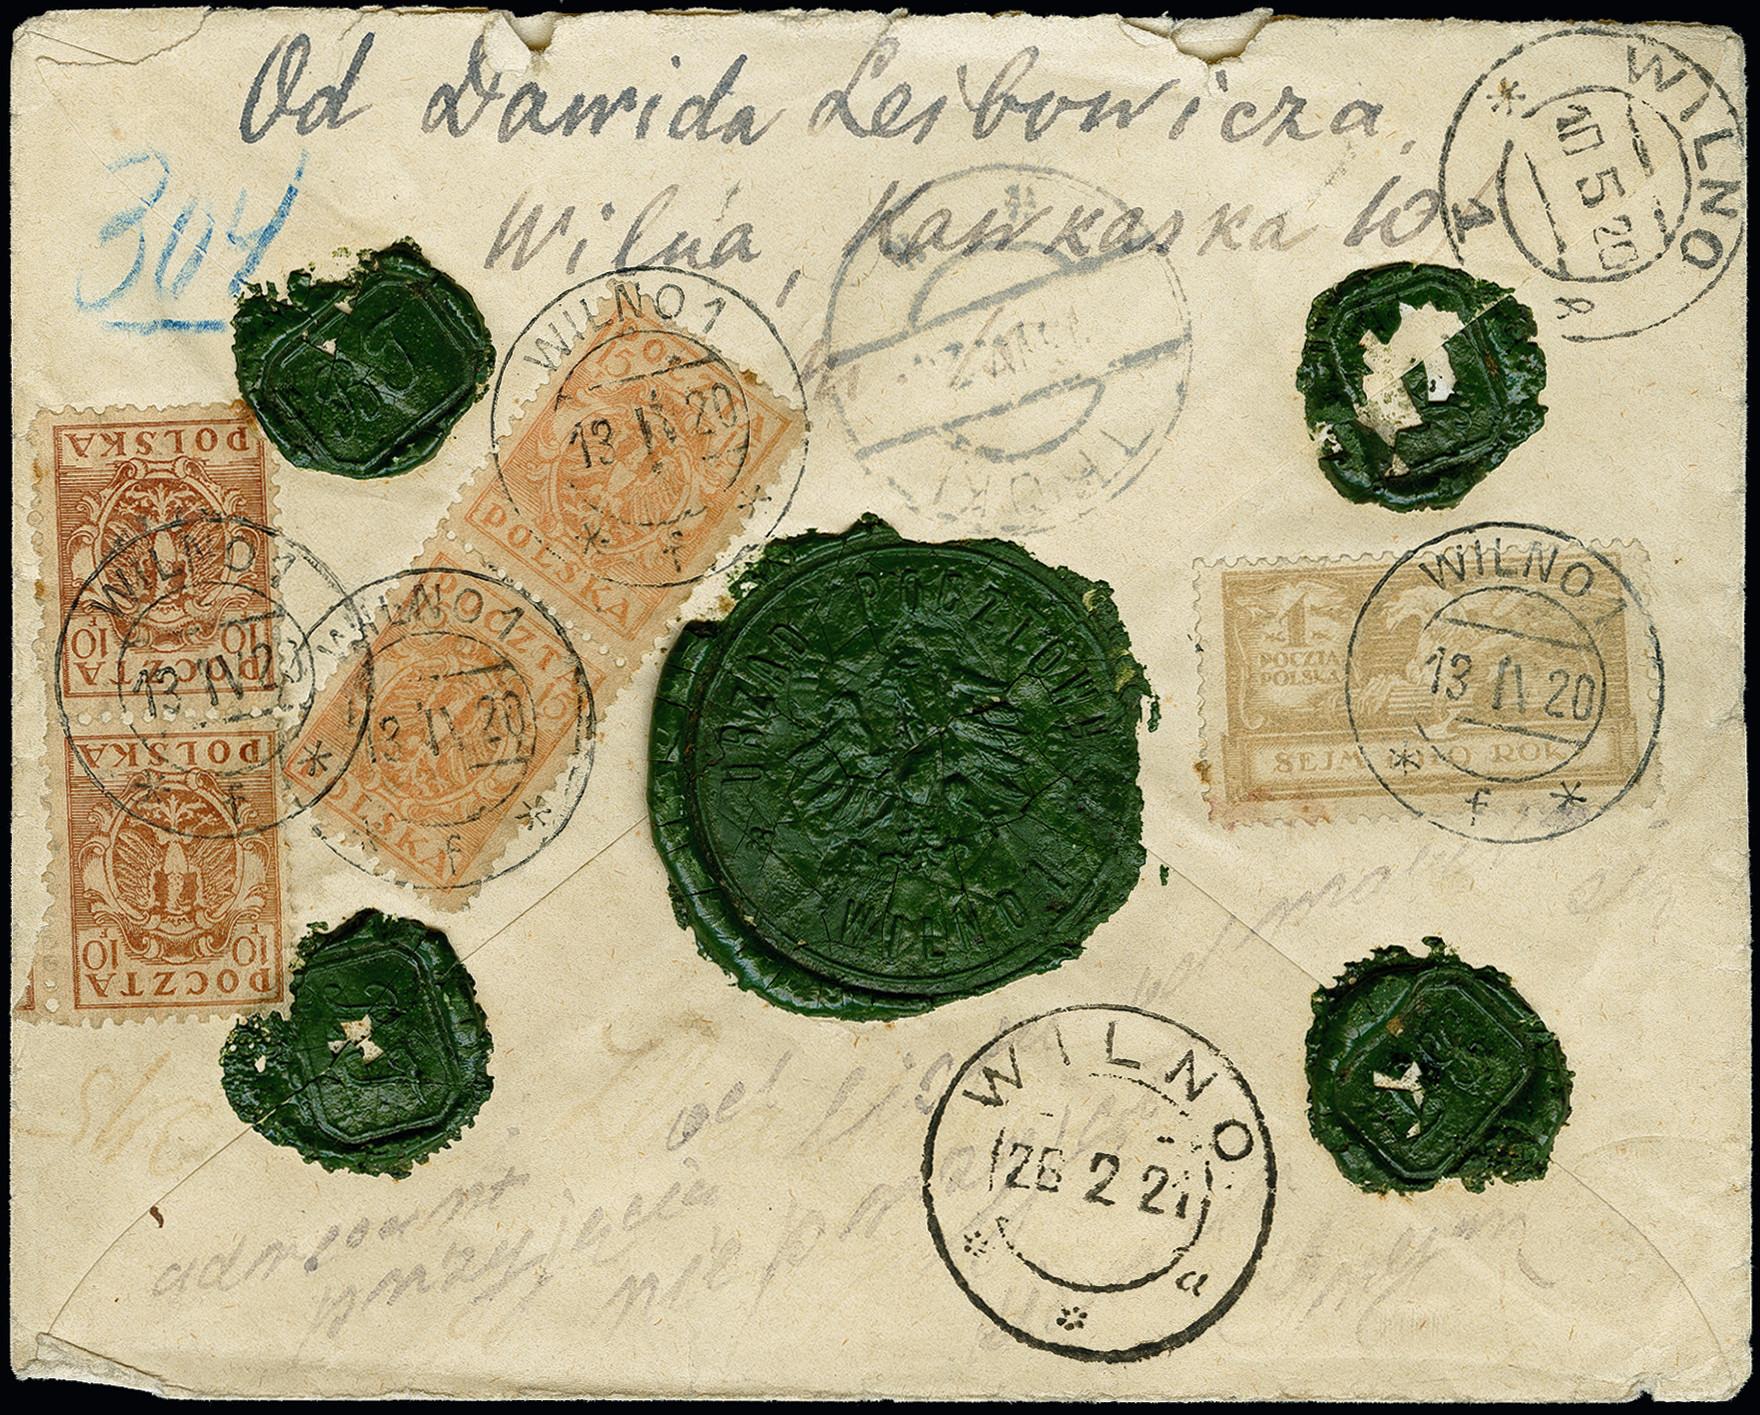 Lot 197 - europe Central Lithuania, Poland -  Heinrich Koehler Auktionen 373rd Heinrich Köhler auction - Day 1